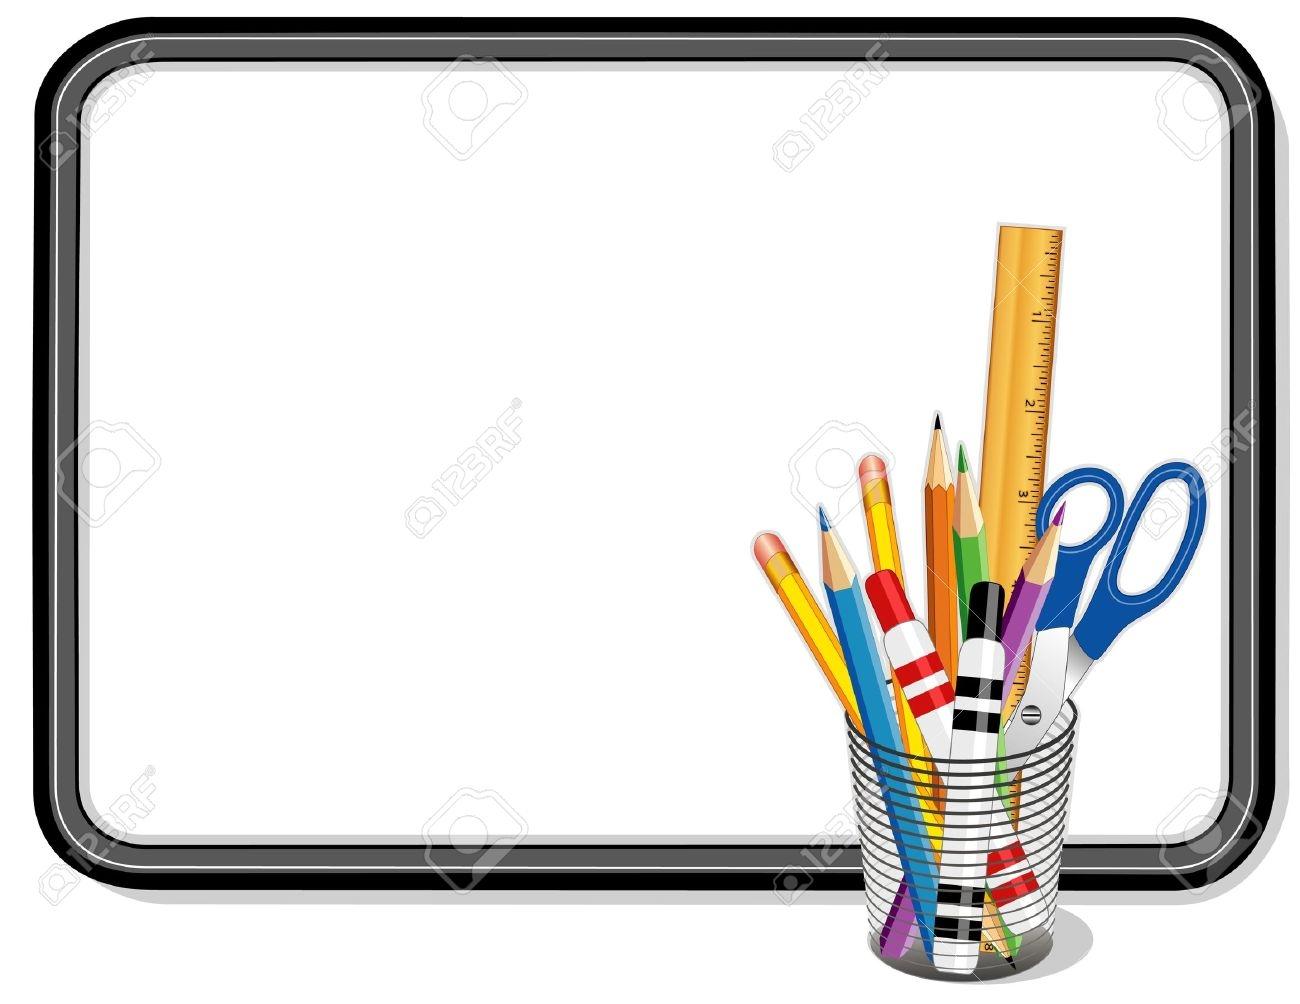 Whiteboard clipart Inspirational Classroom whiteboard clipart Clip.